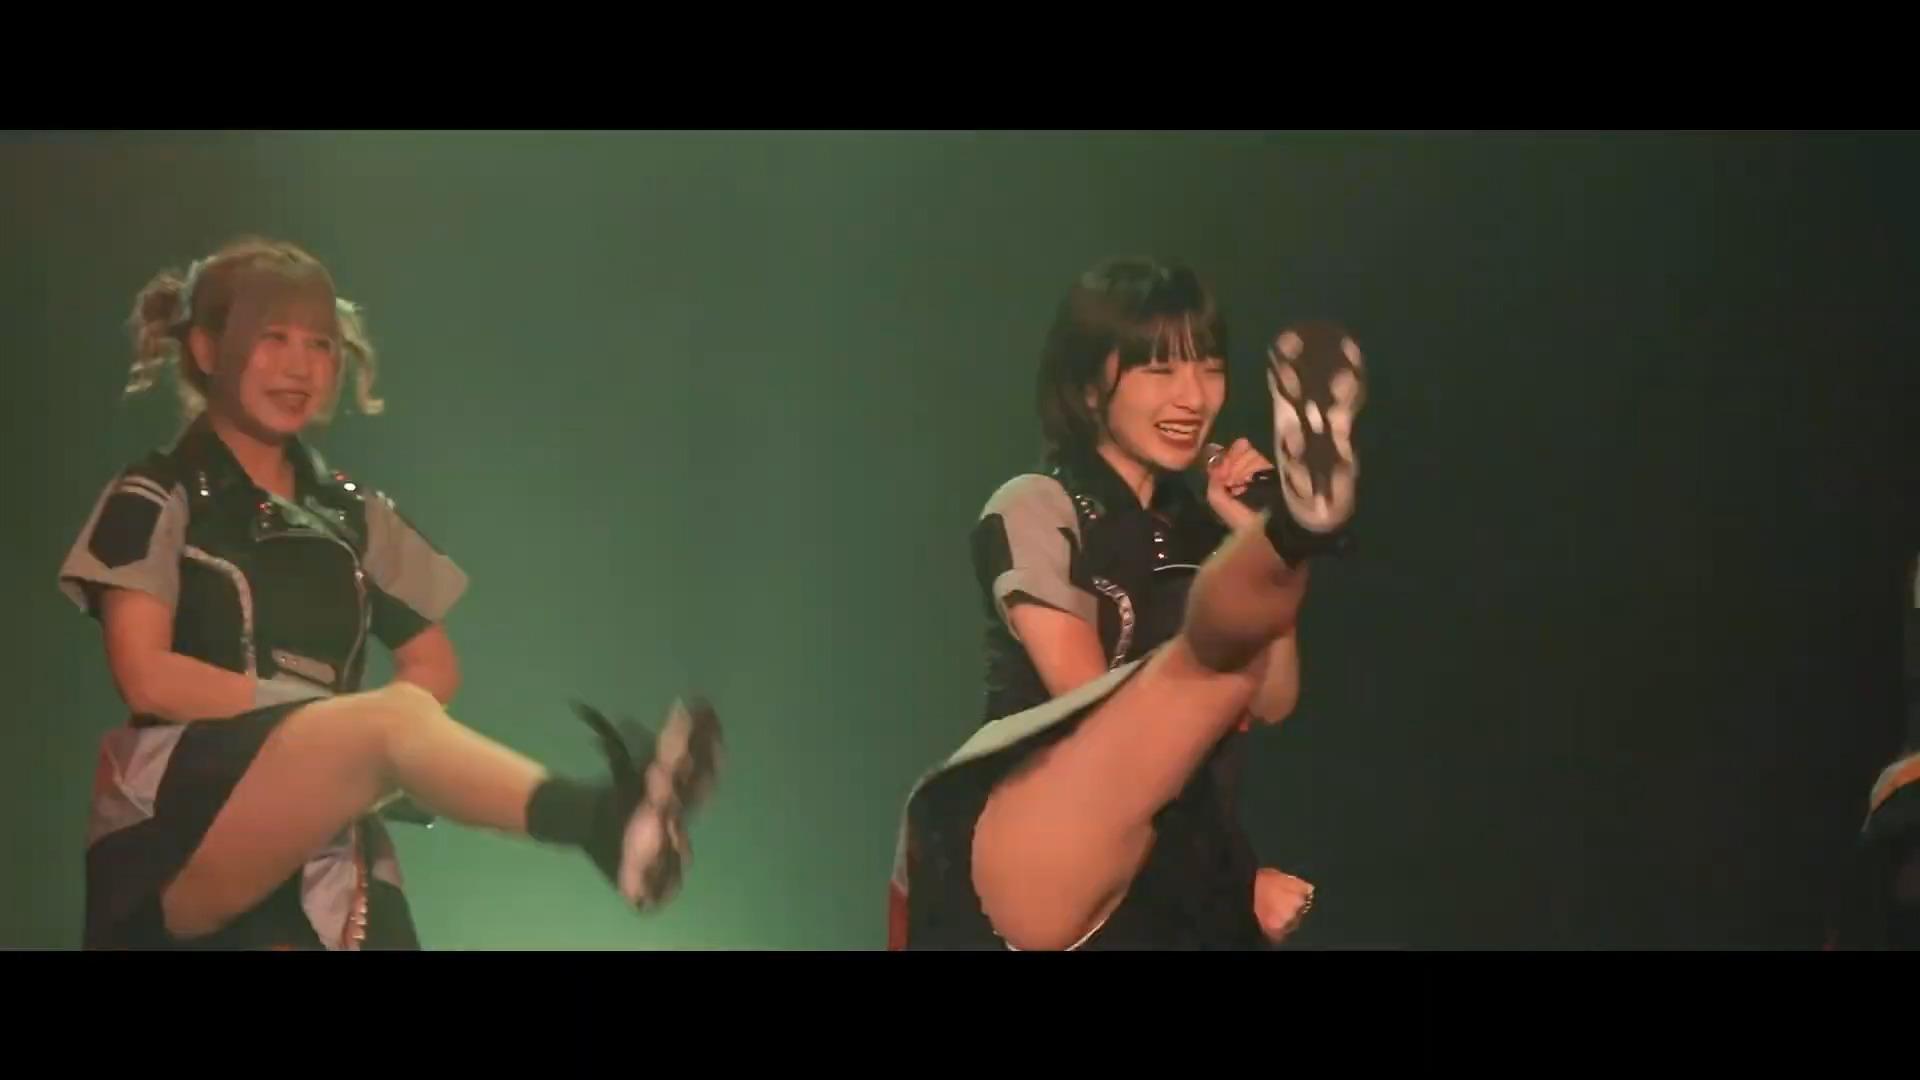 【1stワンマン】#ジューロック「史上最強うぇぽん -名古屋ver.-」@2020/8/13 名古屋ReNY limited 01:11